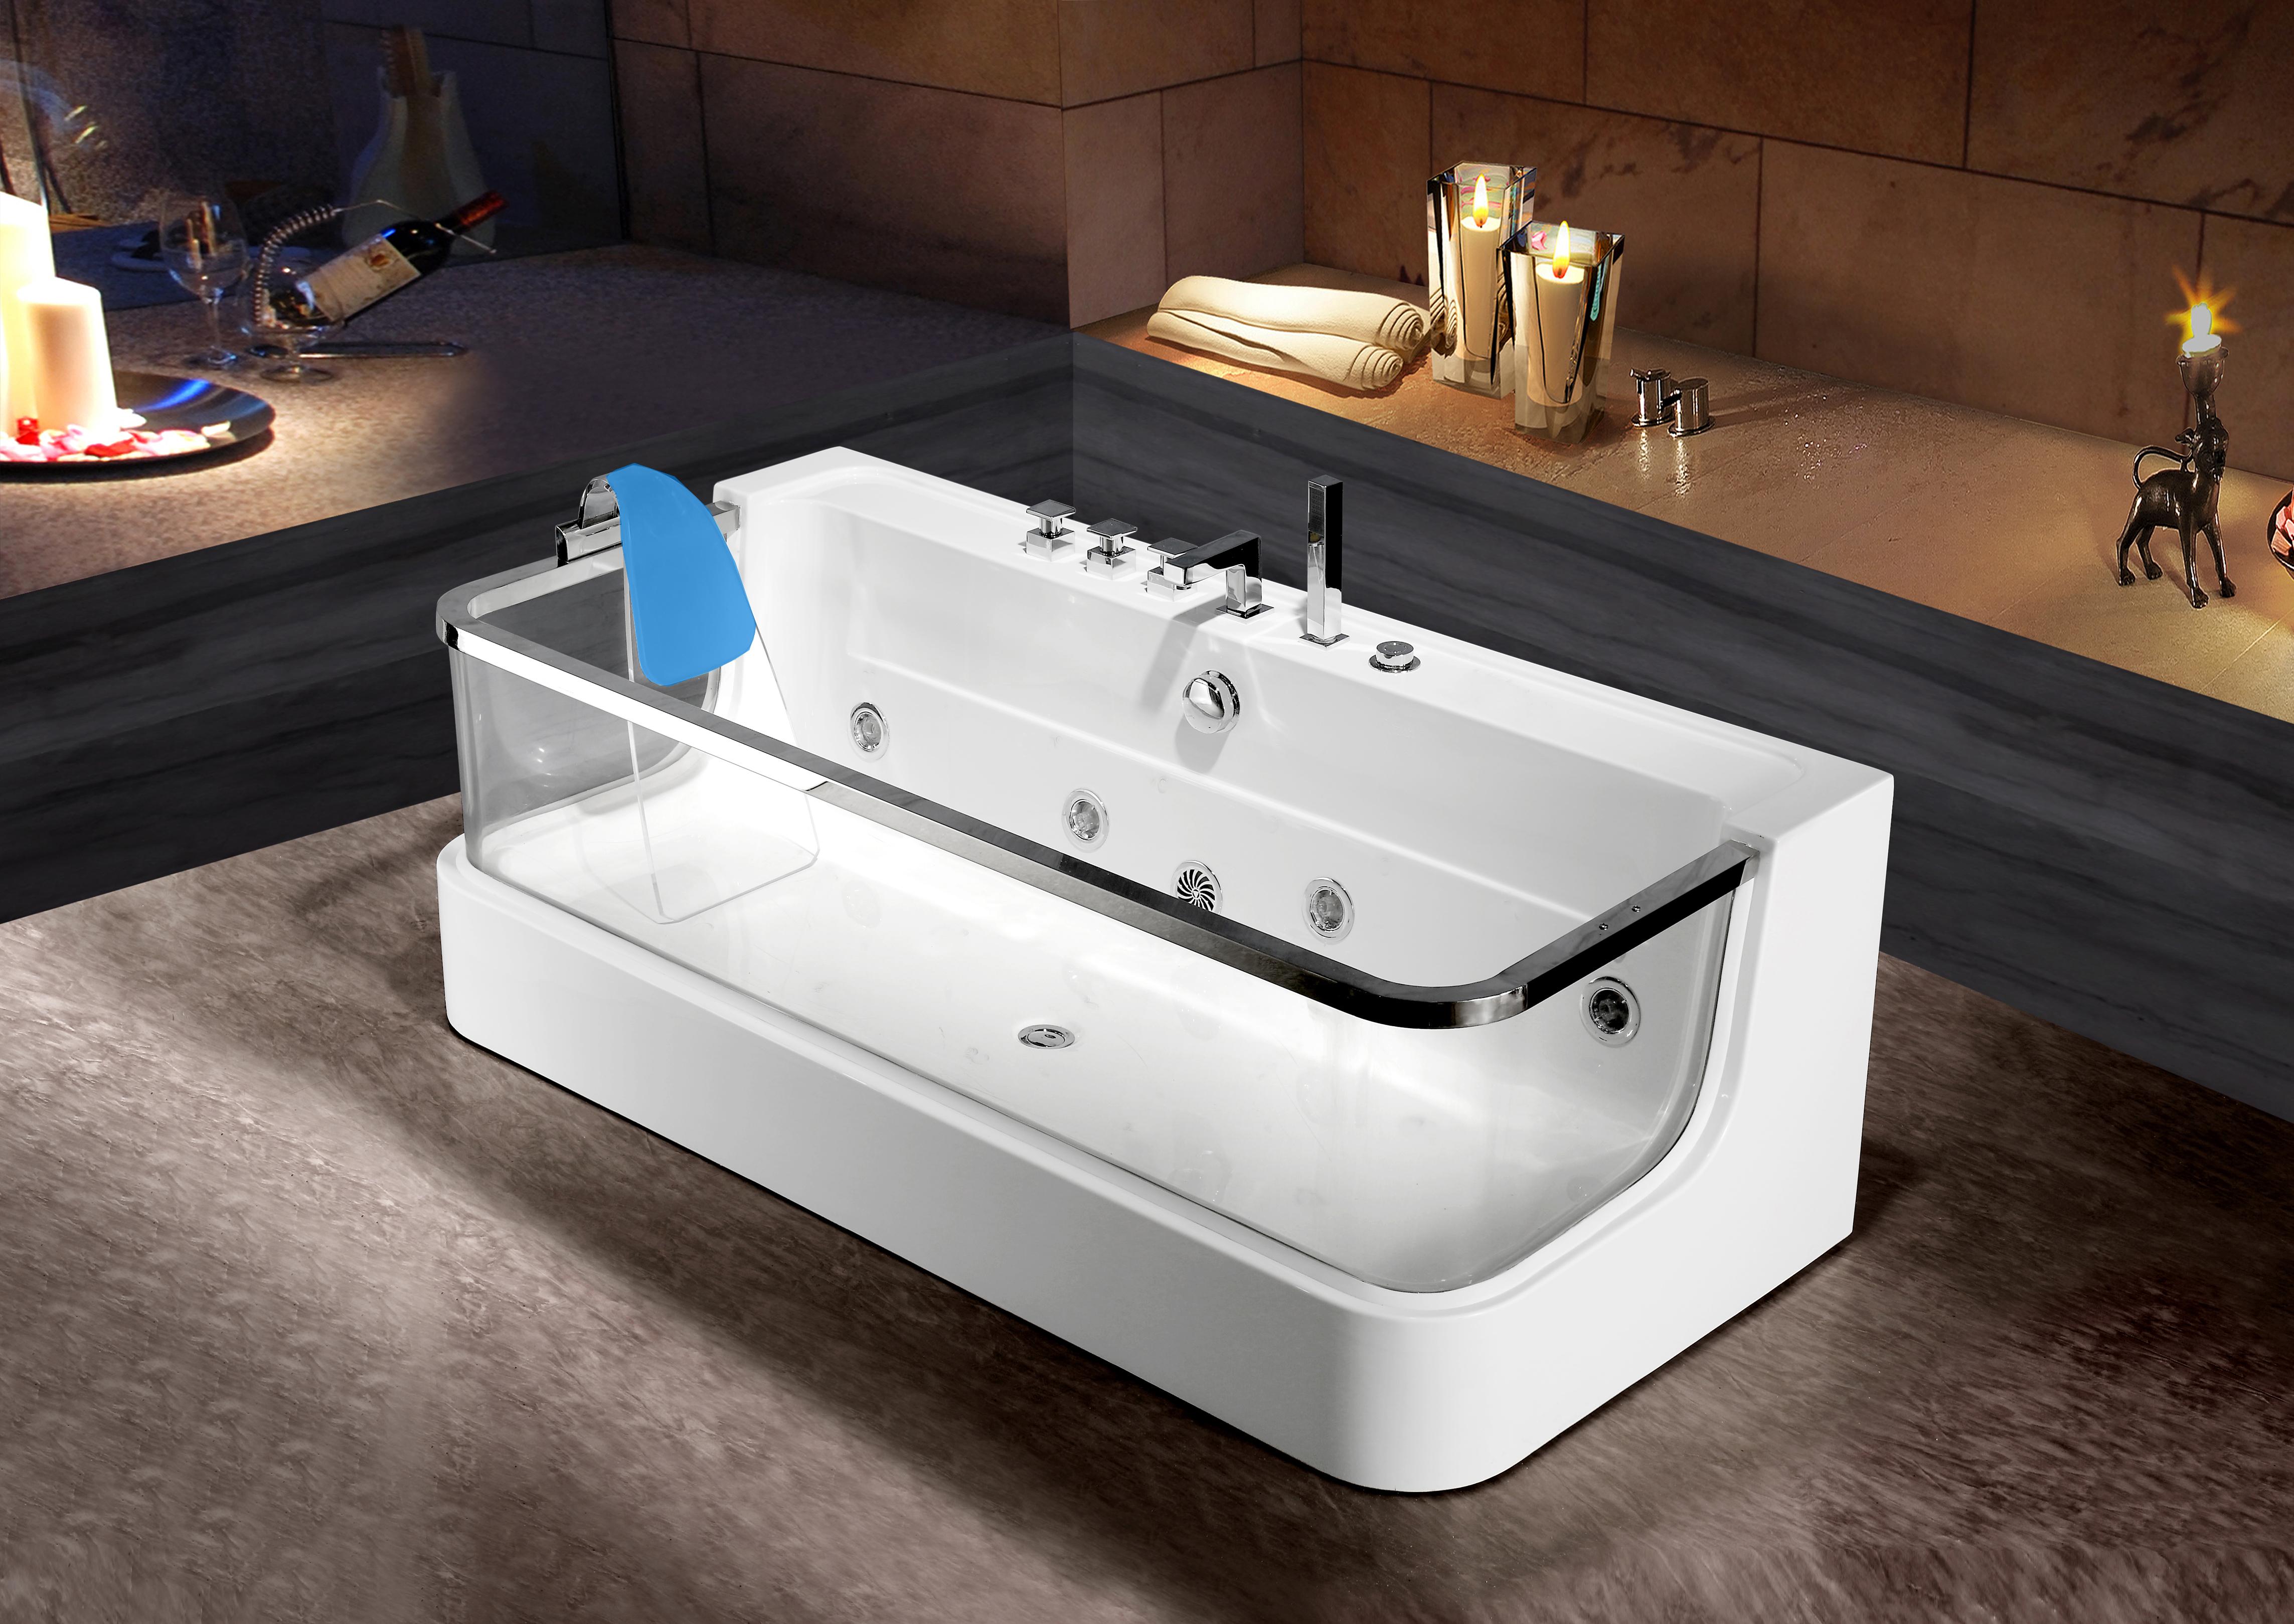 Vasca Da Bagno Larghezza 65 Cm : Vasca da bagno whirlpool whirlwanne piscina acrilico lxw ebay